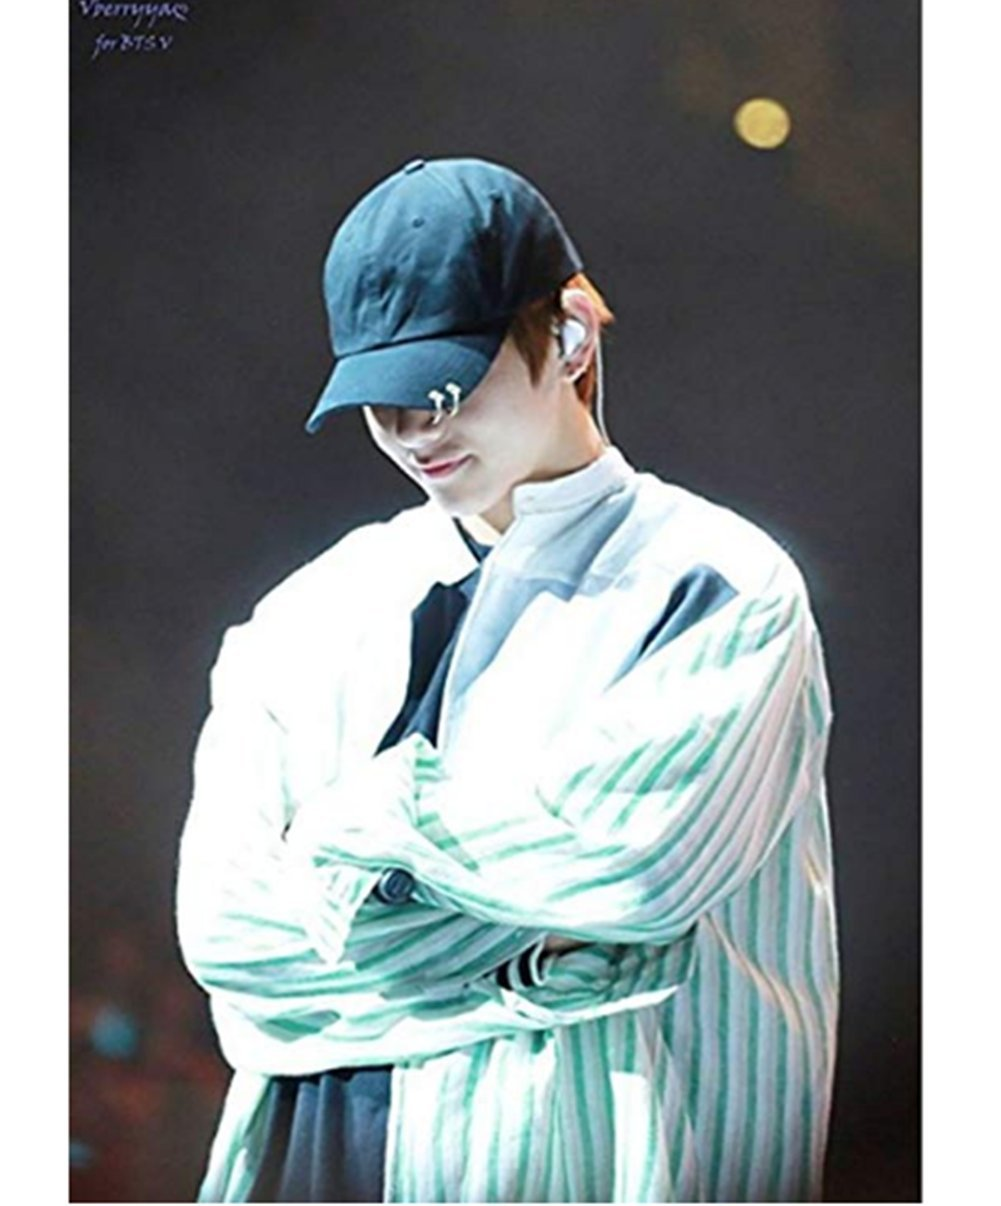 Bosunshine BTS Love Yourself V Suga Jin Jimin Jung Kook Casual Backpack Daypack Laptop Bag College Bag Book Bag School Bag with Hat PK1 by Bosunshine (Image #4)